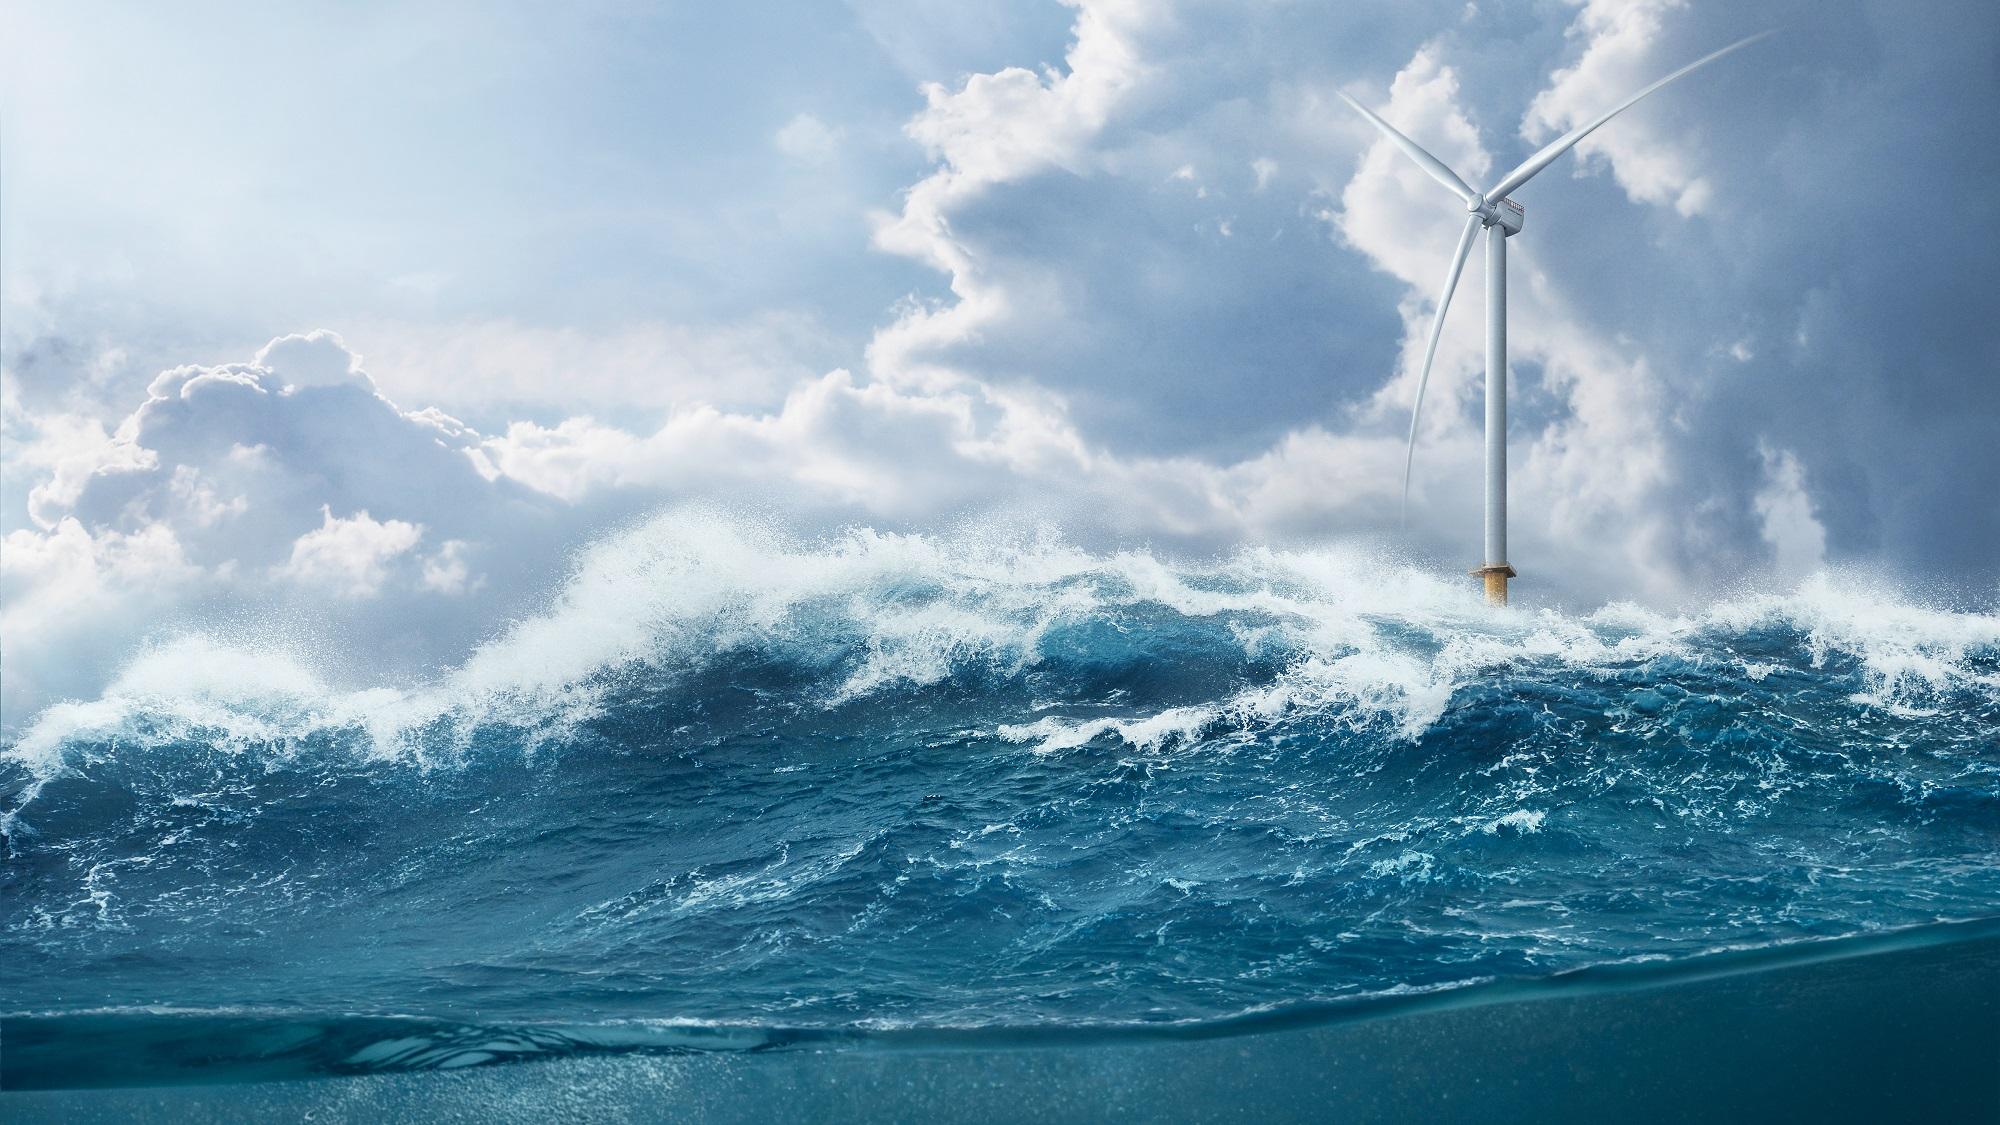 Siemens Gamesa cranks it up to 15 MW with offshore behemoth